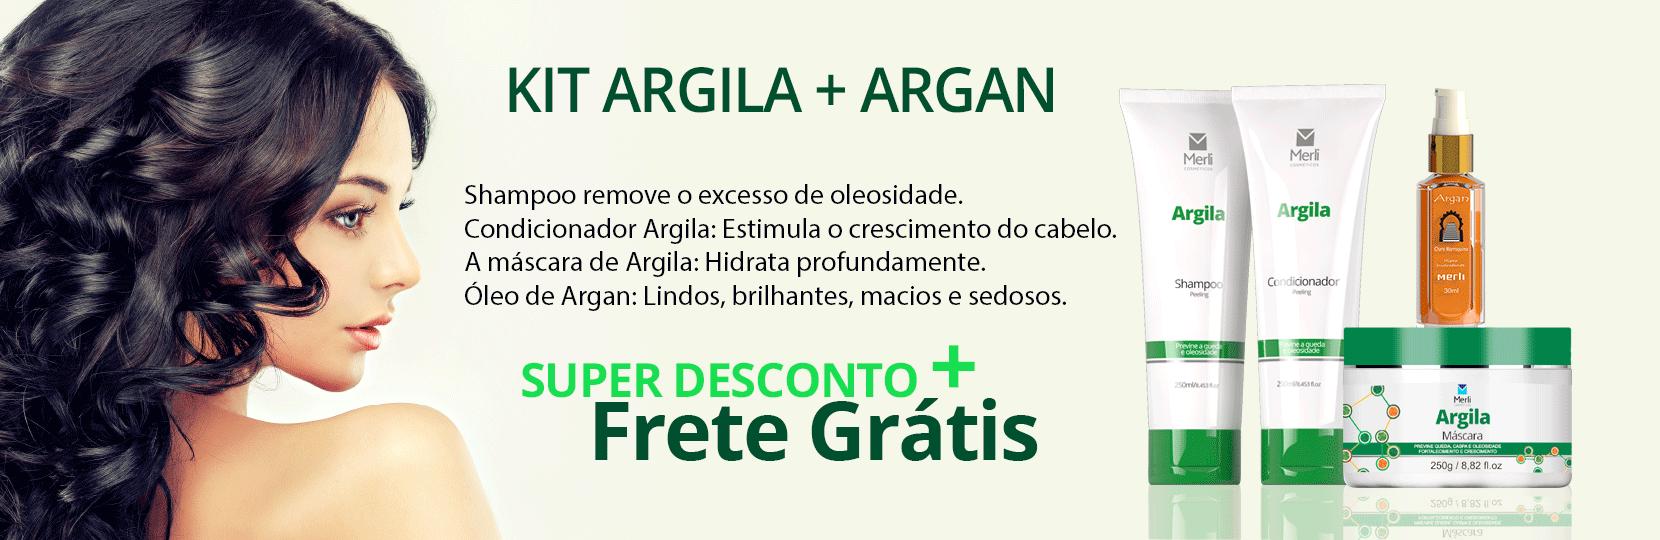 kIT ARGILA + ÓLEO DE ARGAN